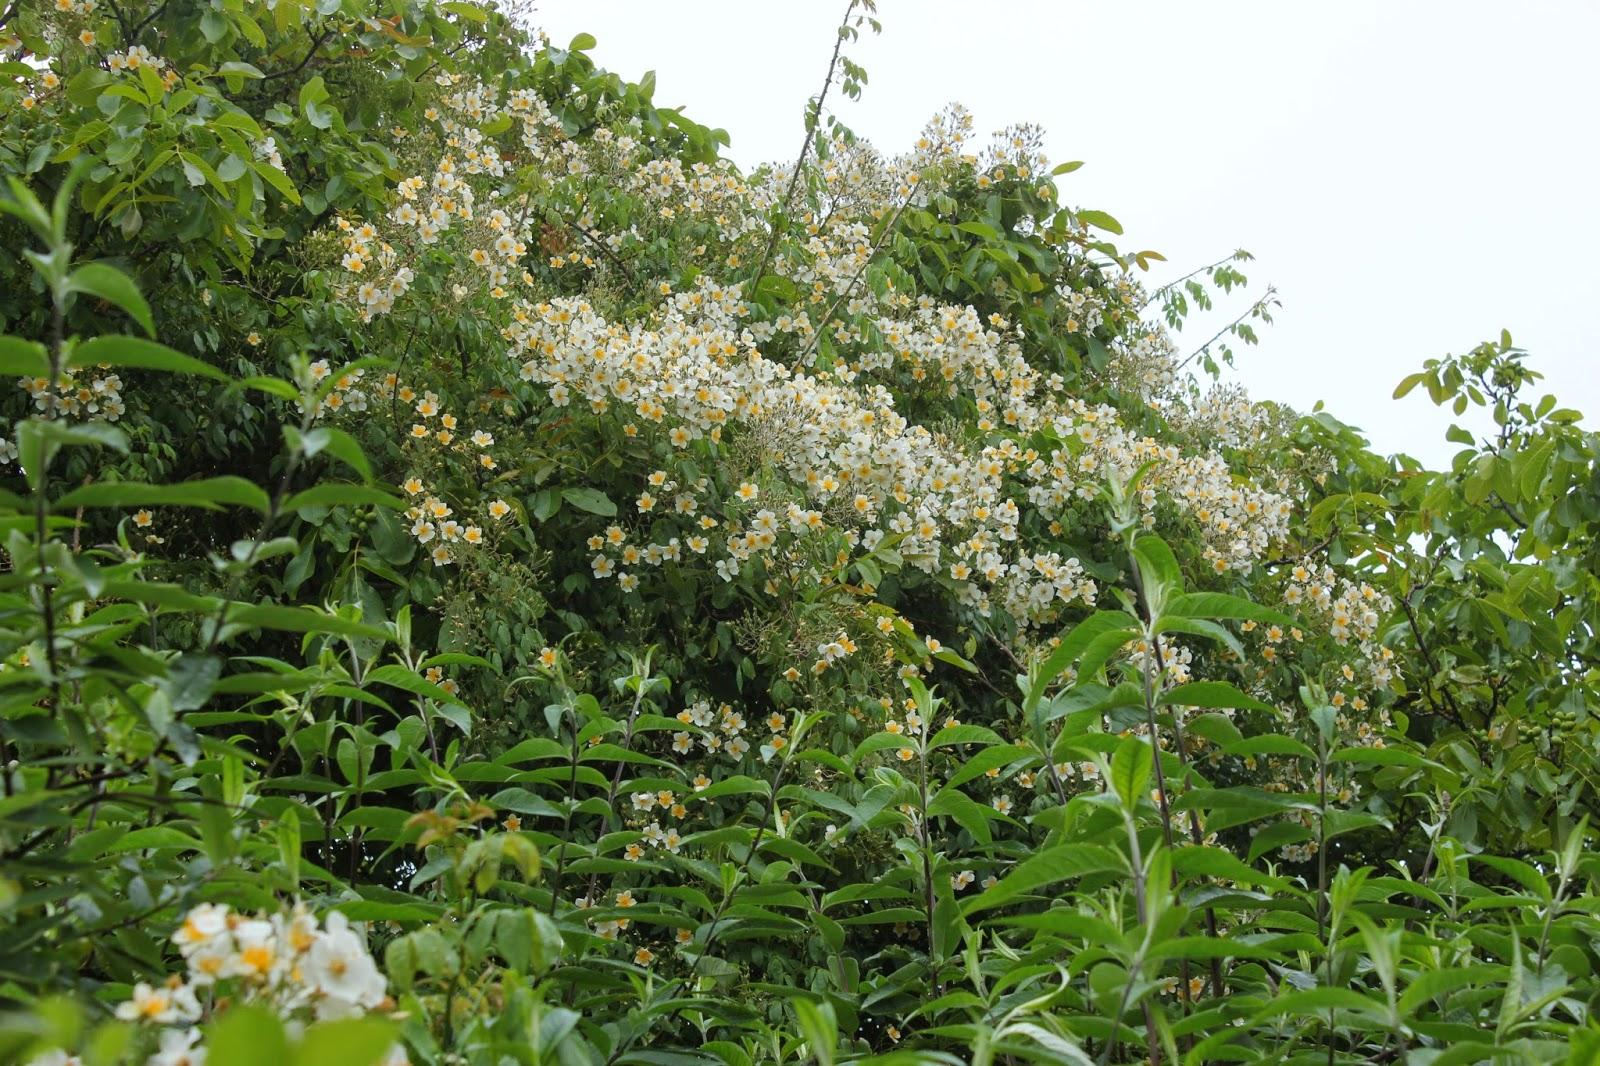 rosa filipes 'Kiftsgate' in a forest garden in France